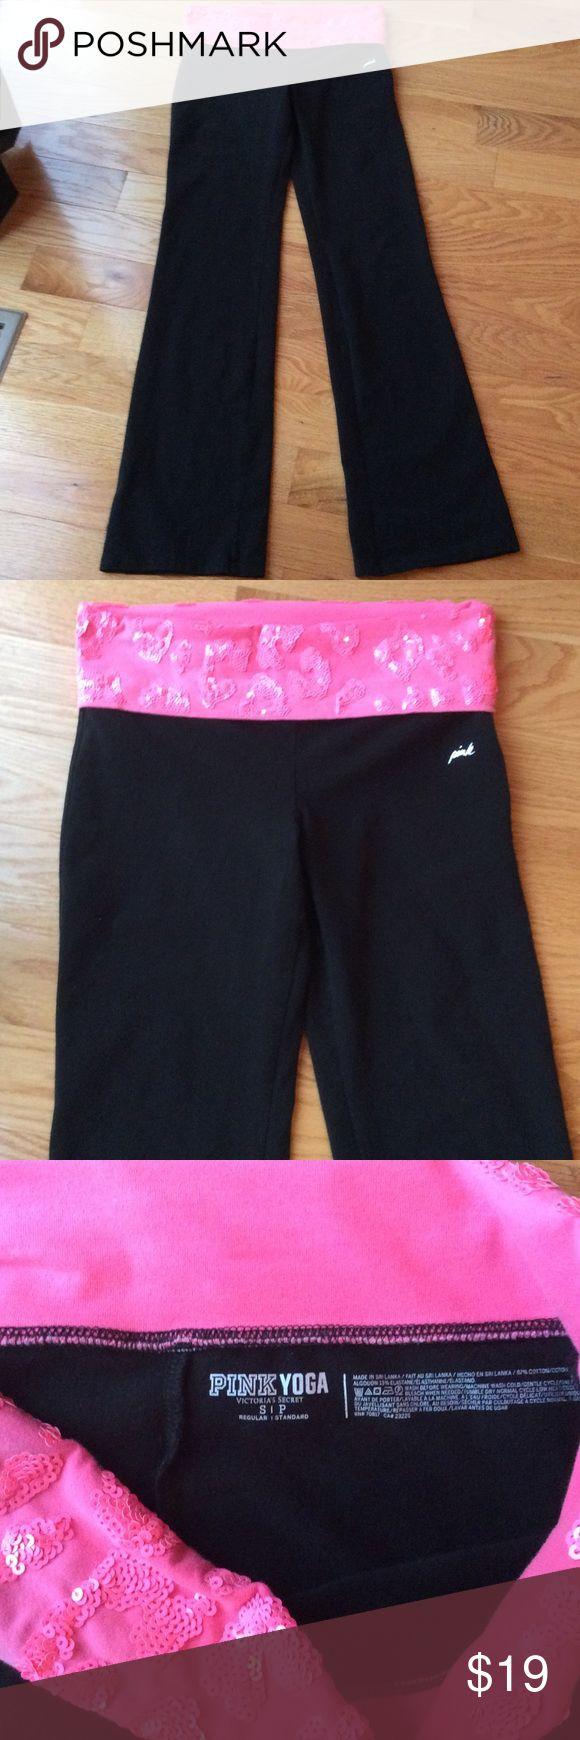 Victoria's Secret PINK fold over Yoga Pants Victoria's Secret PINK fold over Yoga pants - size small. Regular length. Has pink sequins on band. Excellent condition. PINK Victoria's Secret Pants Straight Leg